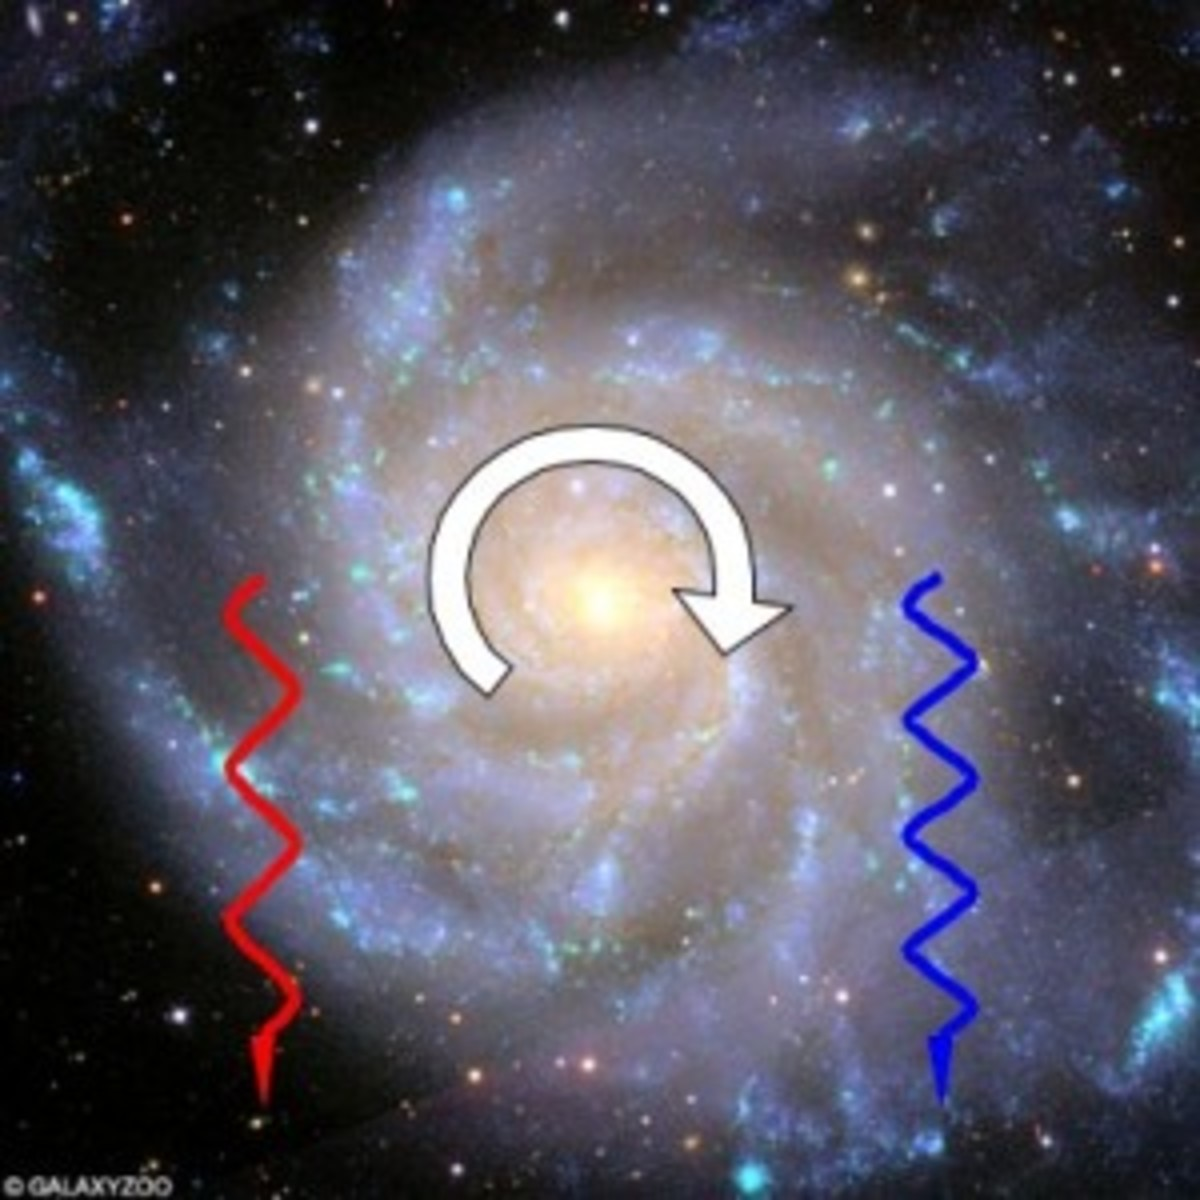 The Doppler Effect: Stars moving toward us look bluer, stars moving away look redder.